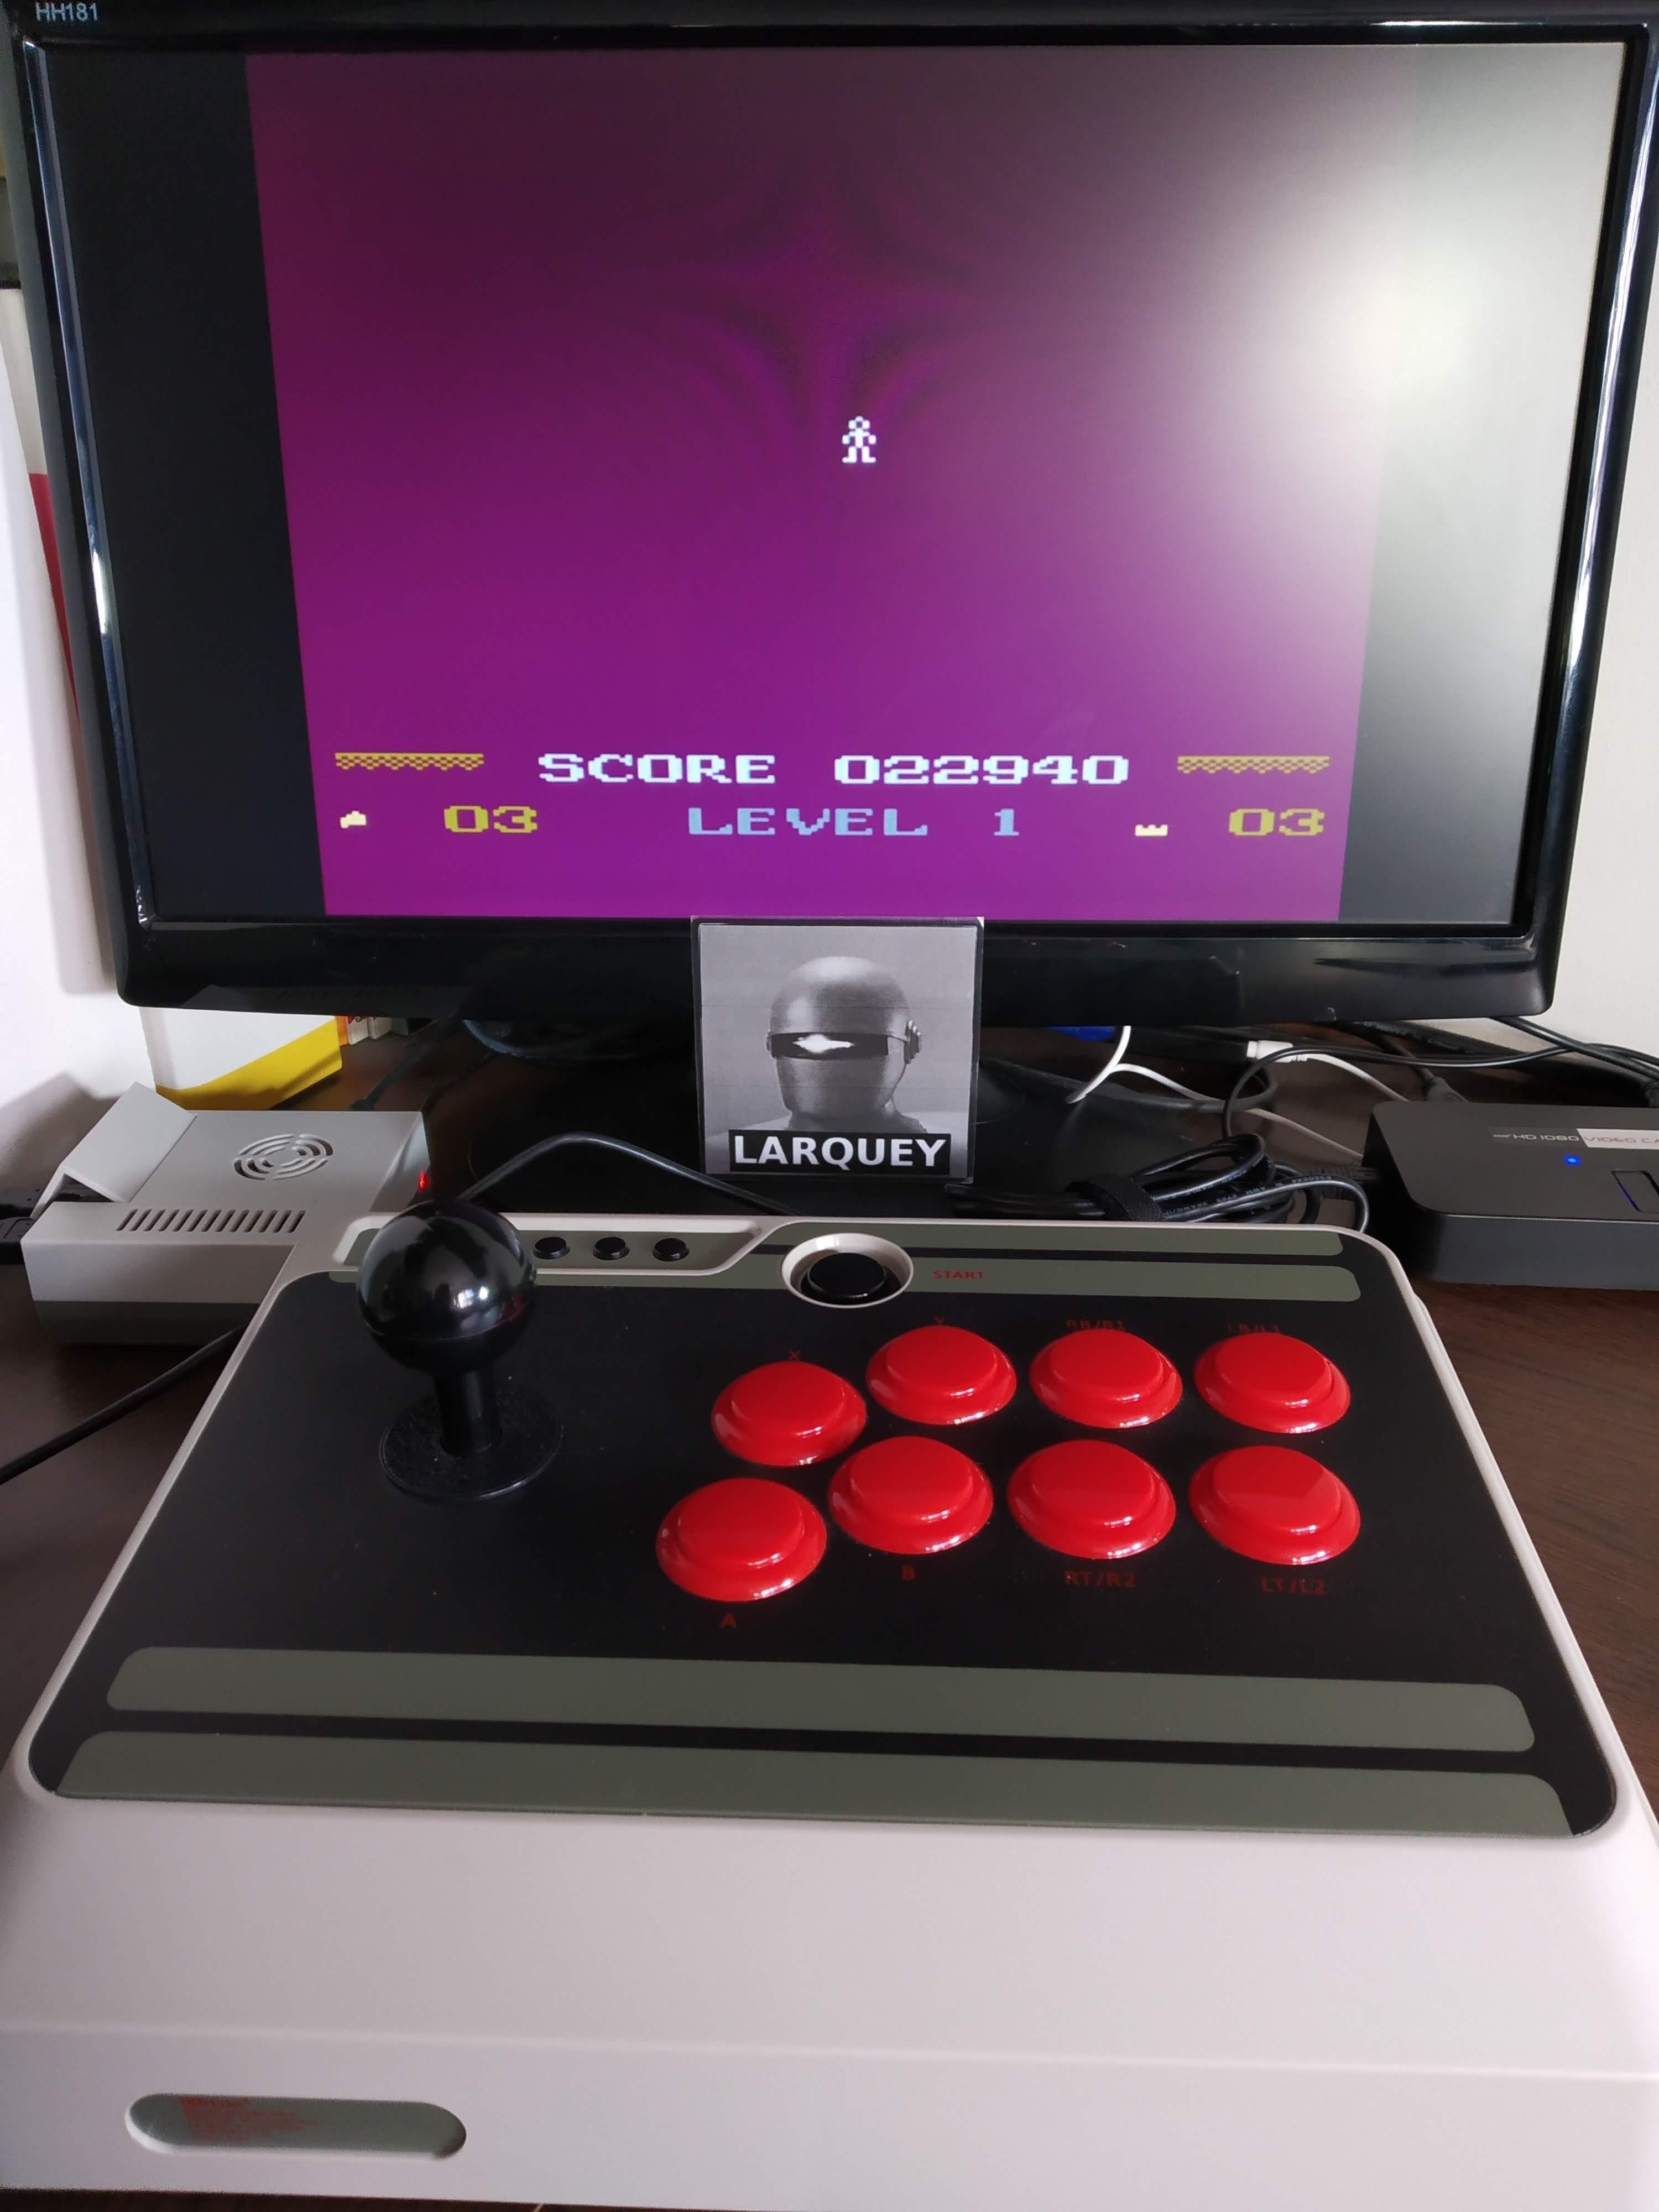 Larquey: Mountain King (Atari 5200 Emulated) 22,940 points on 2019-11-16 11:34:53